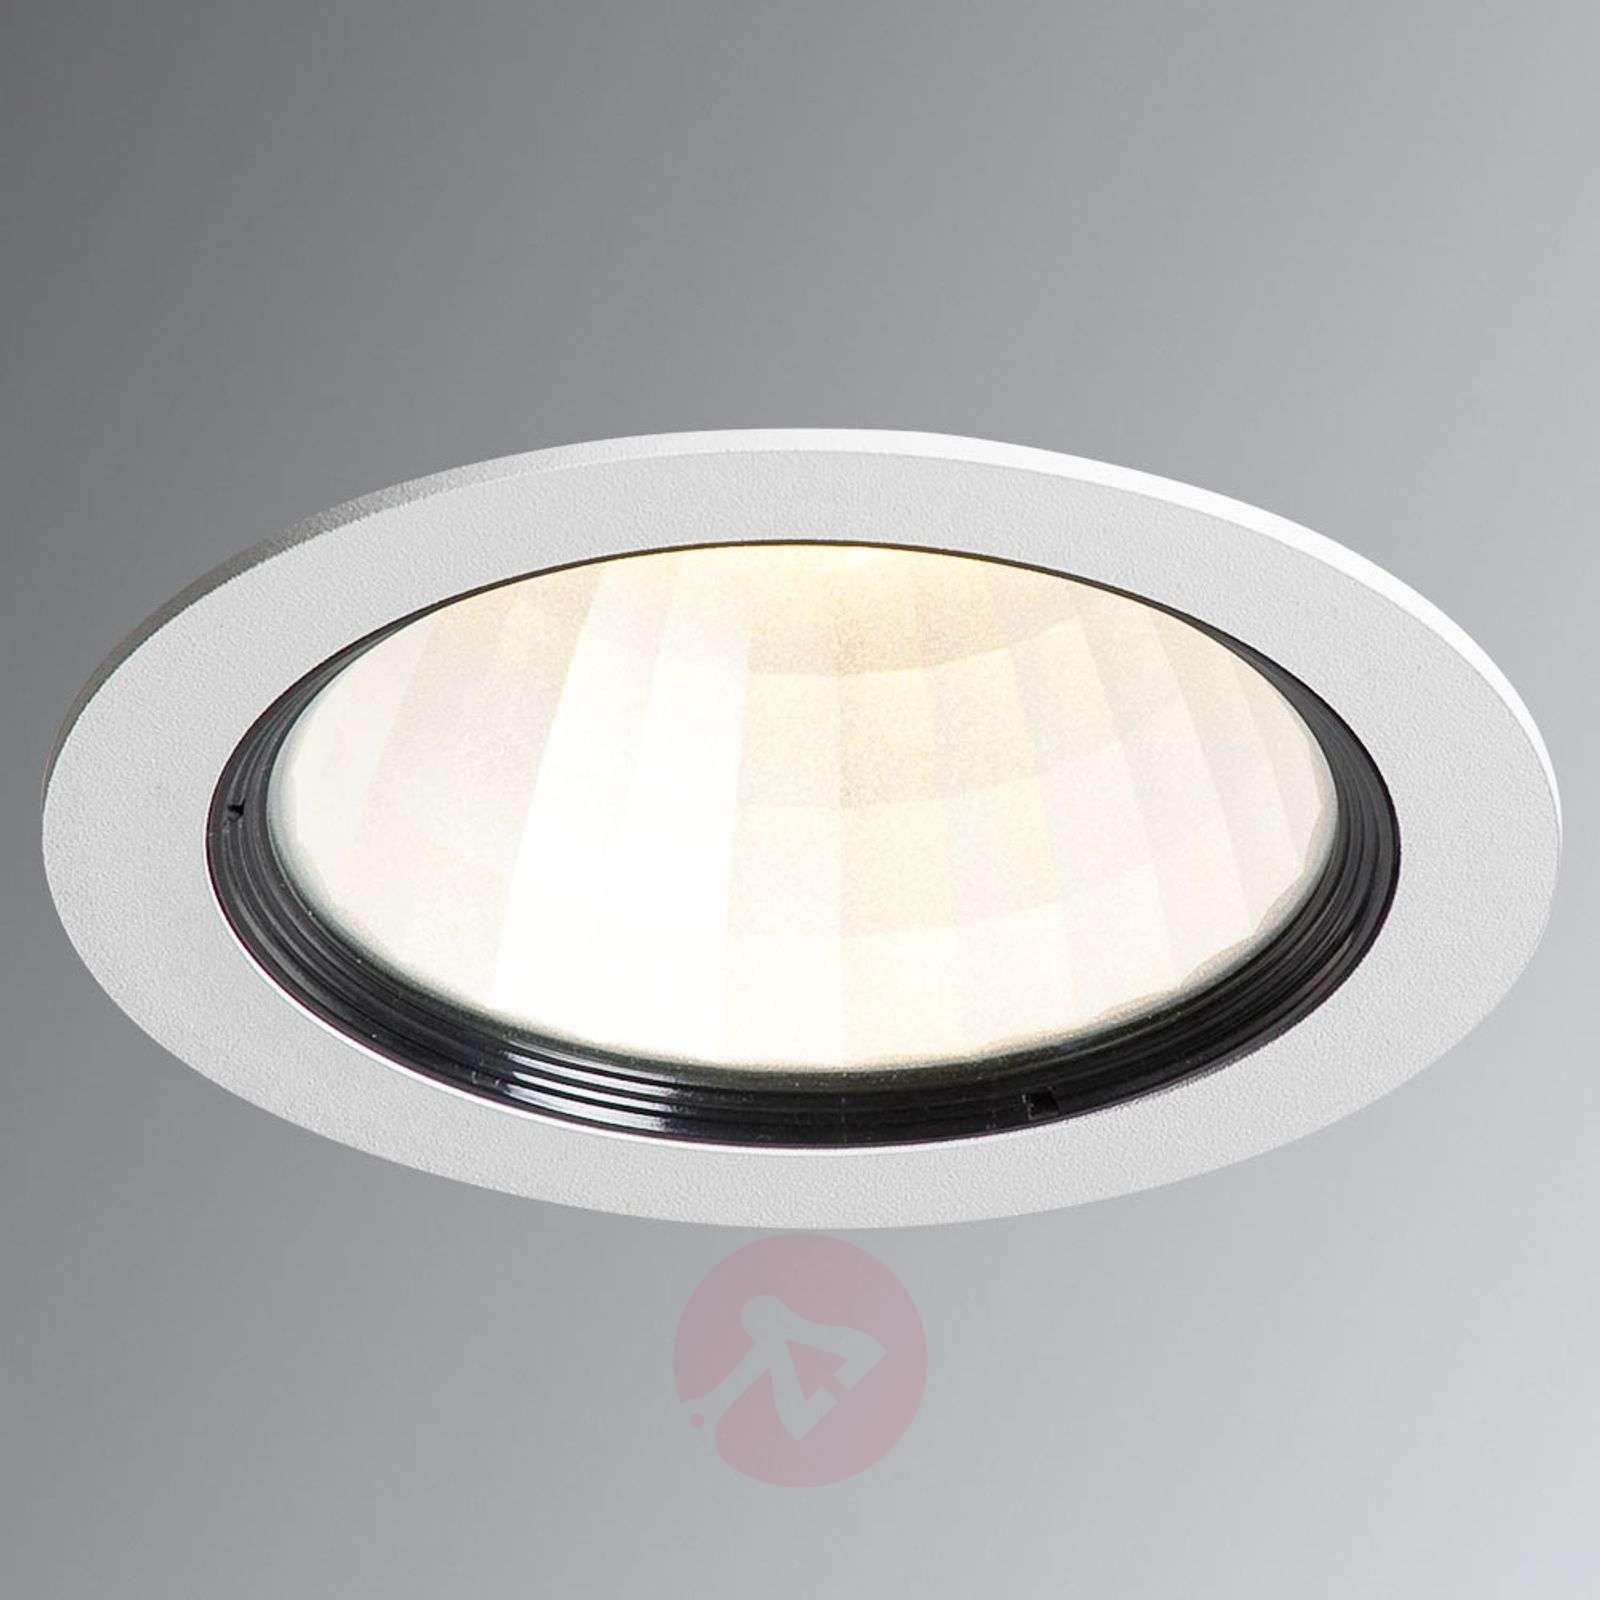 LED-uppospotti Sunray III, 3000K, 27W-6523748-01